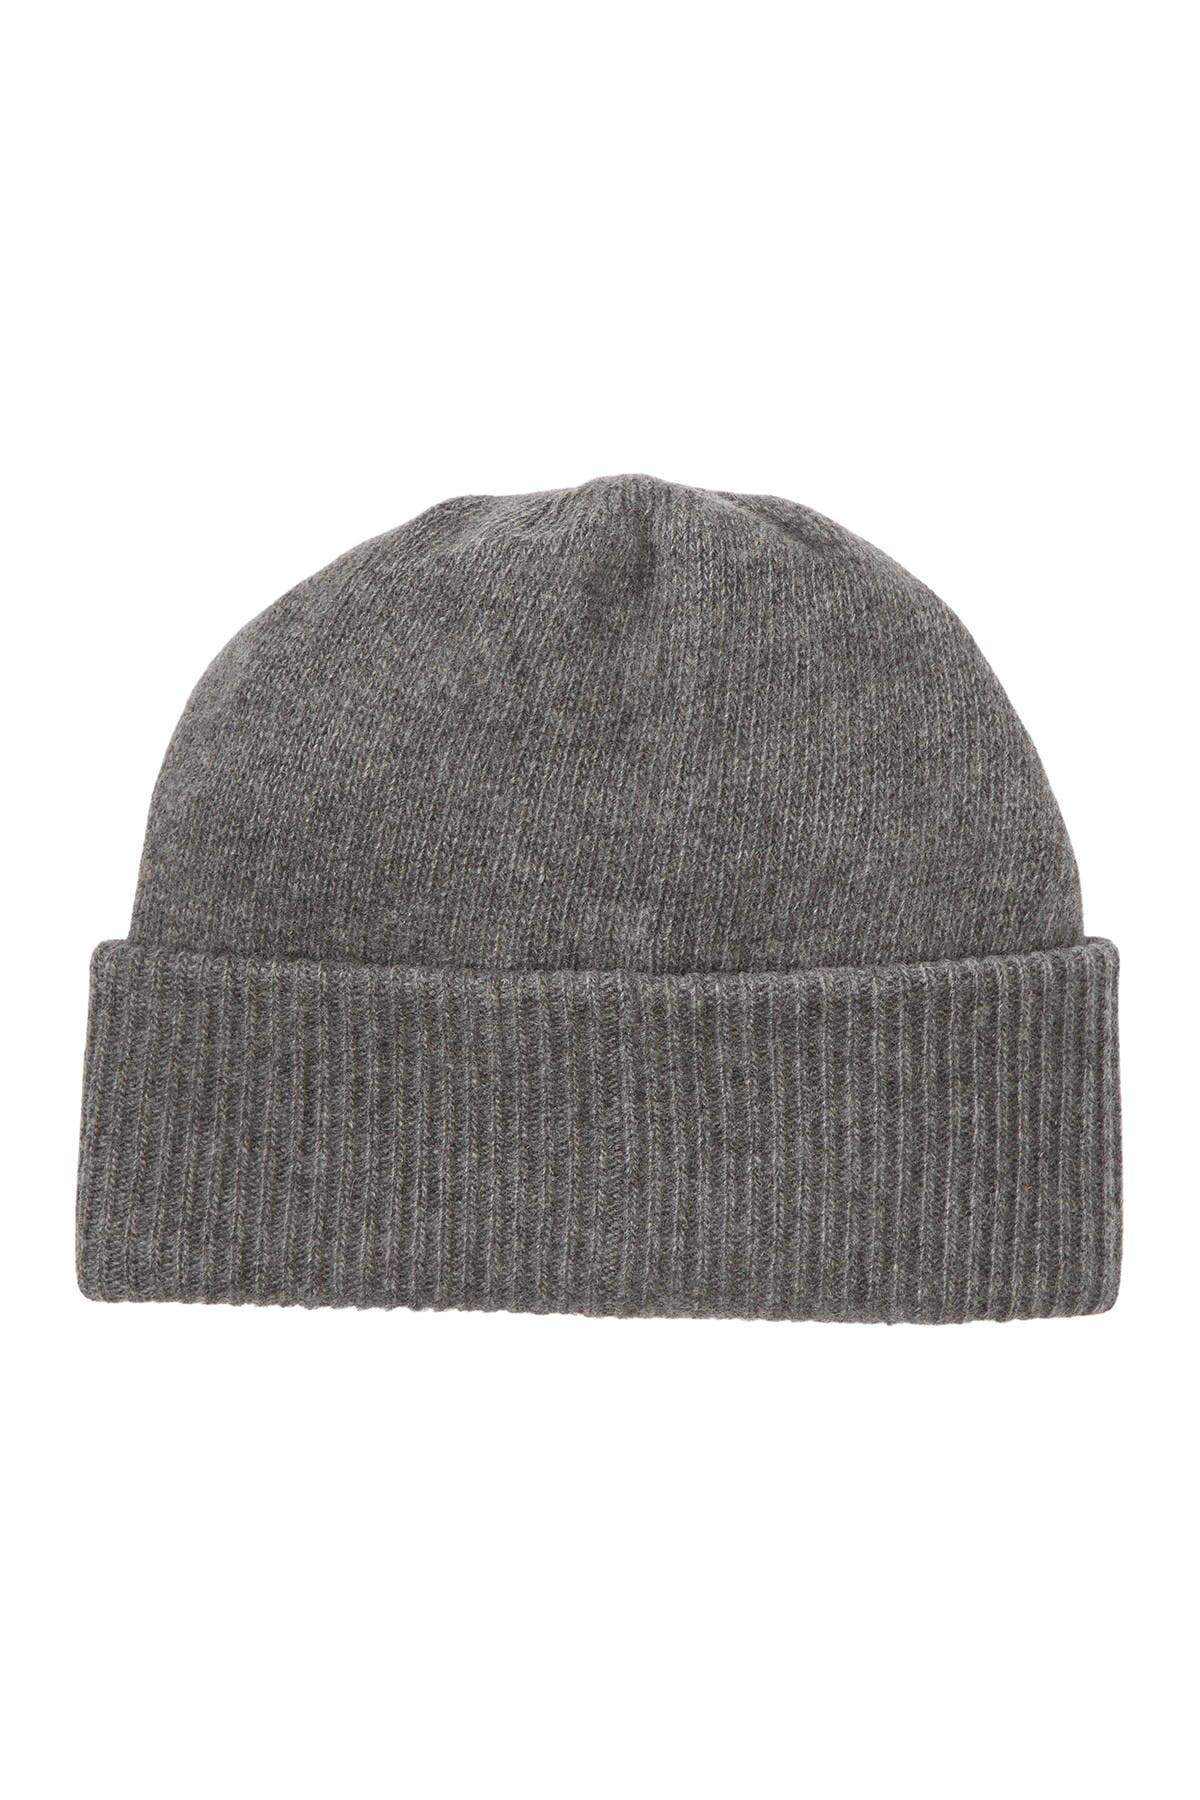 Image of Portolano Cashmere Rib Hat